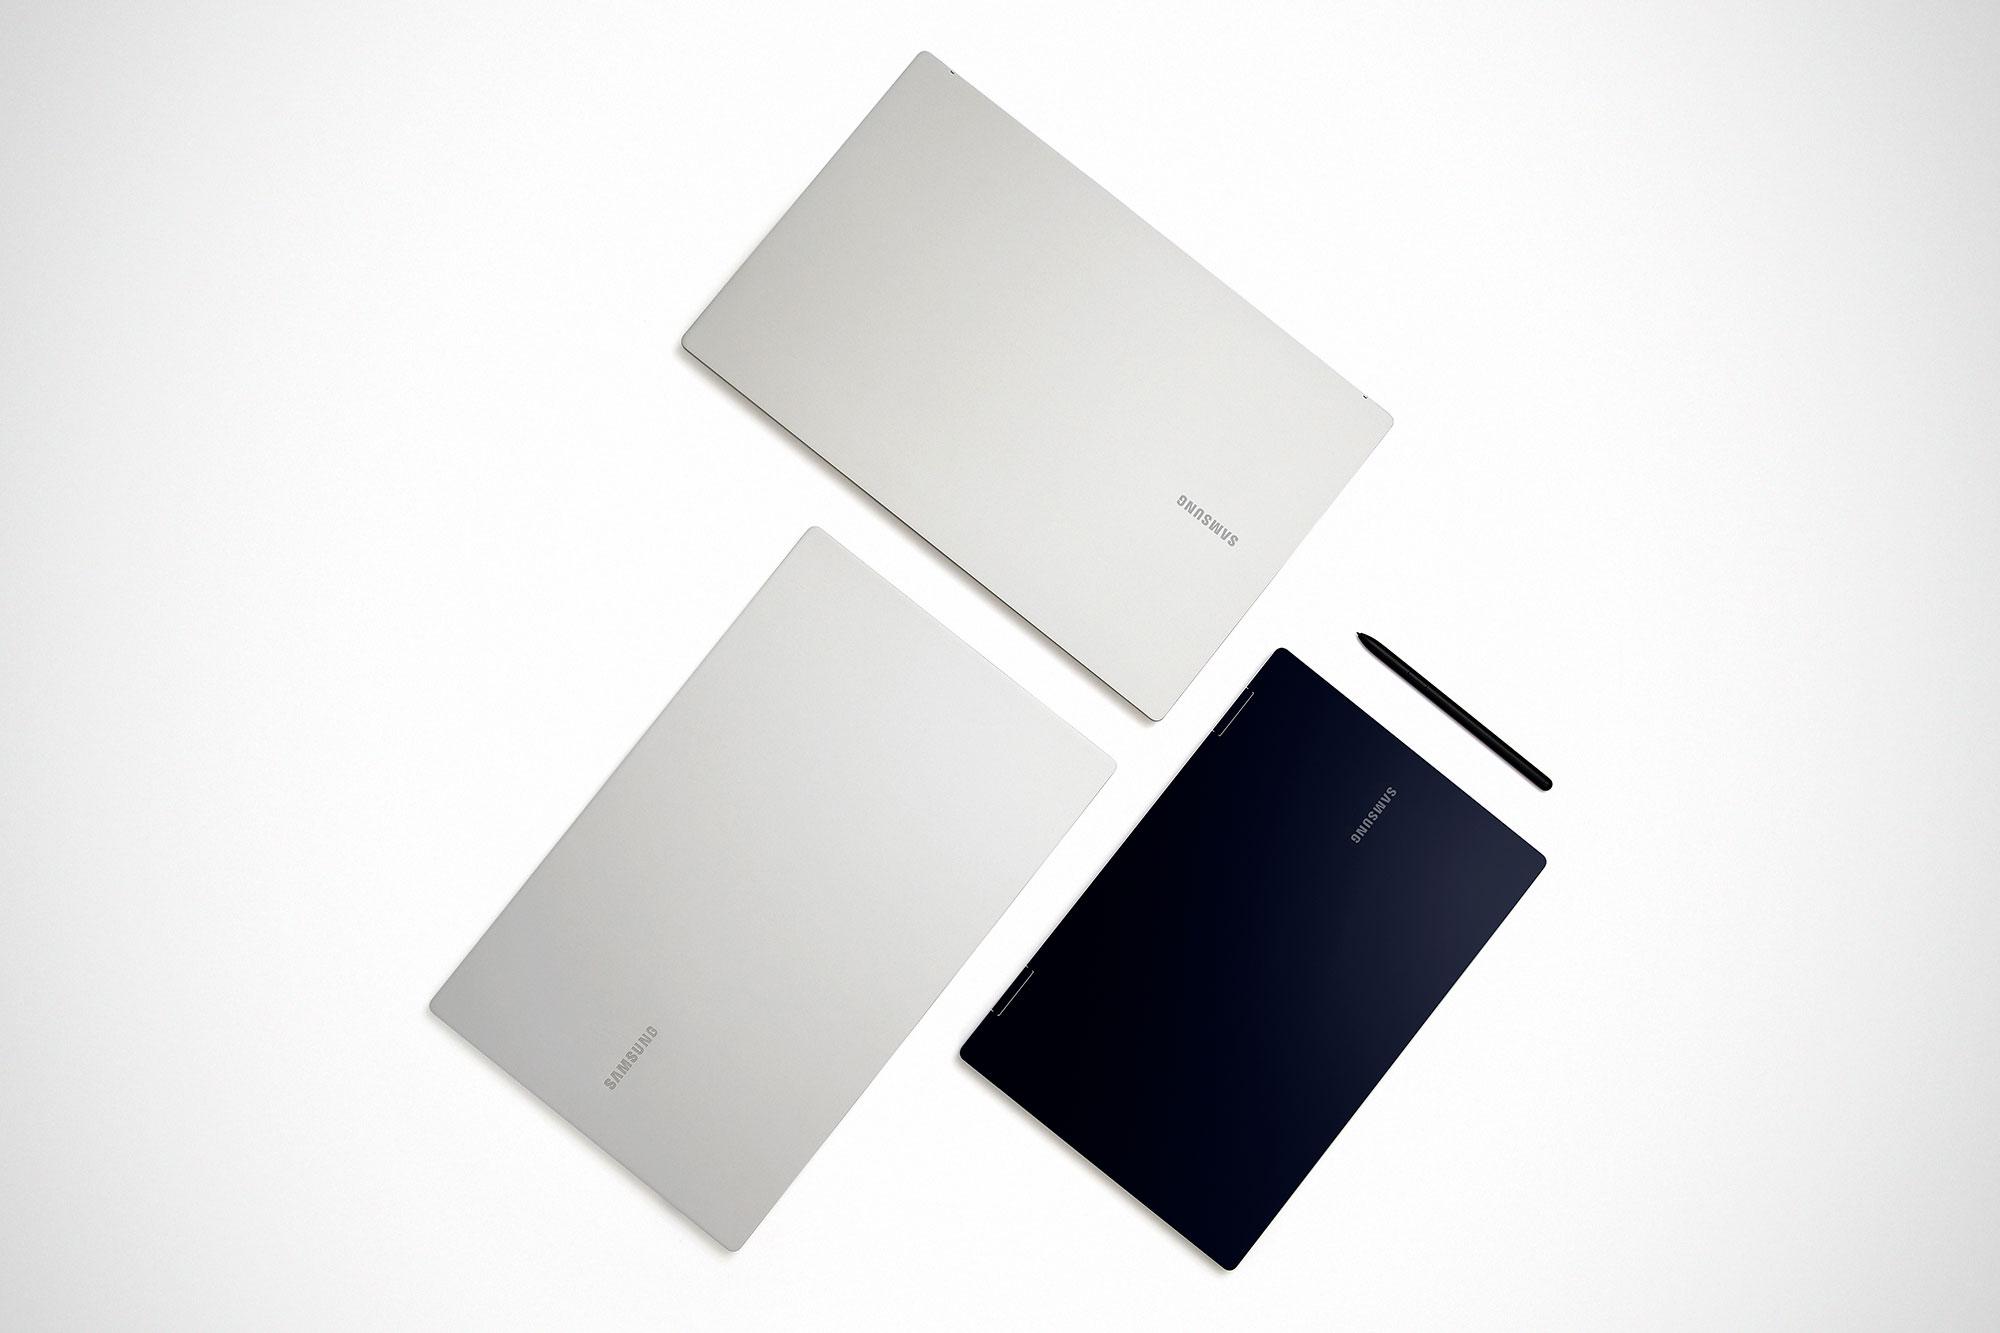 2021 Samsung Galaxy Book Pro and Pro 360